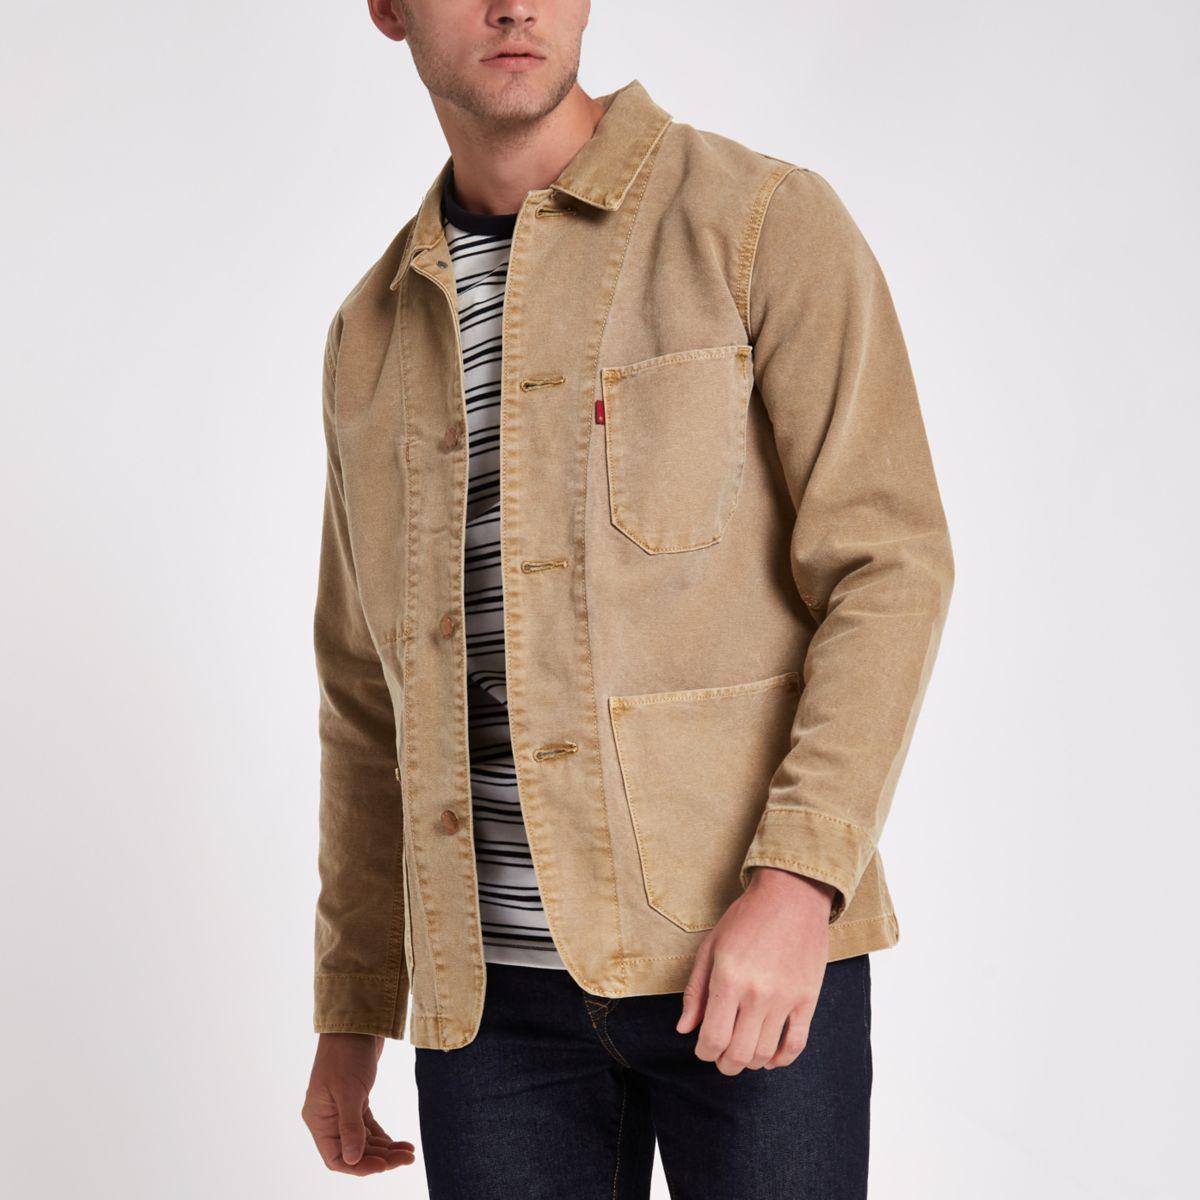 Levi's light brown button up jacket